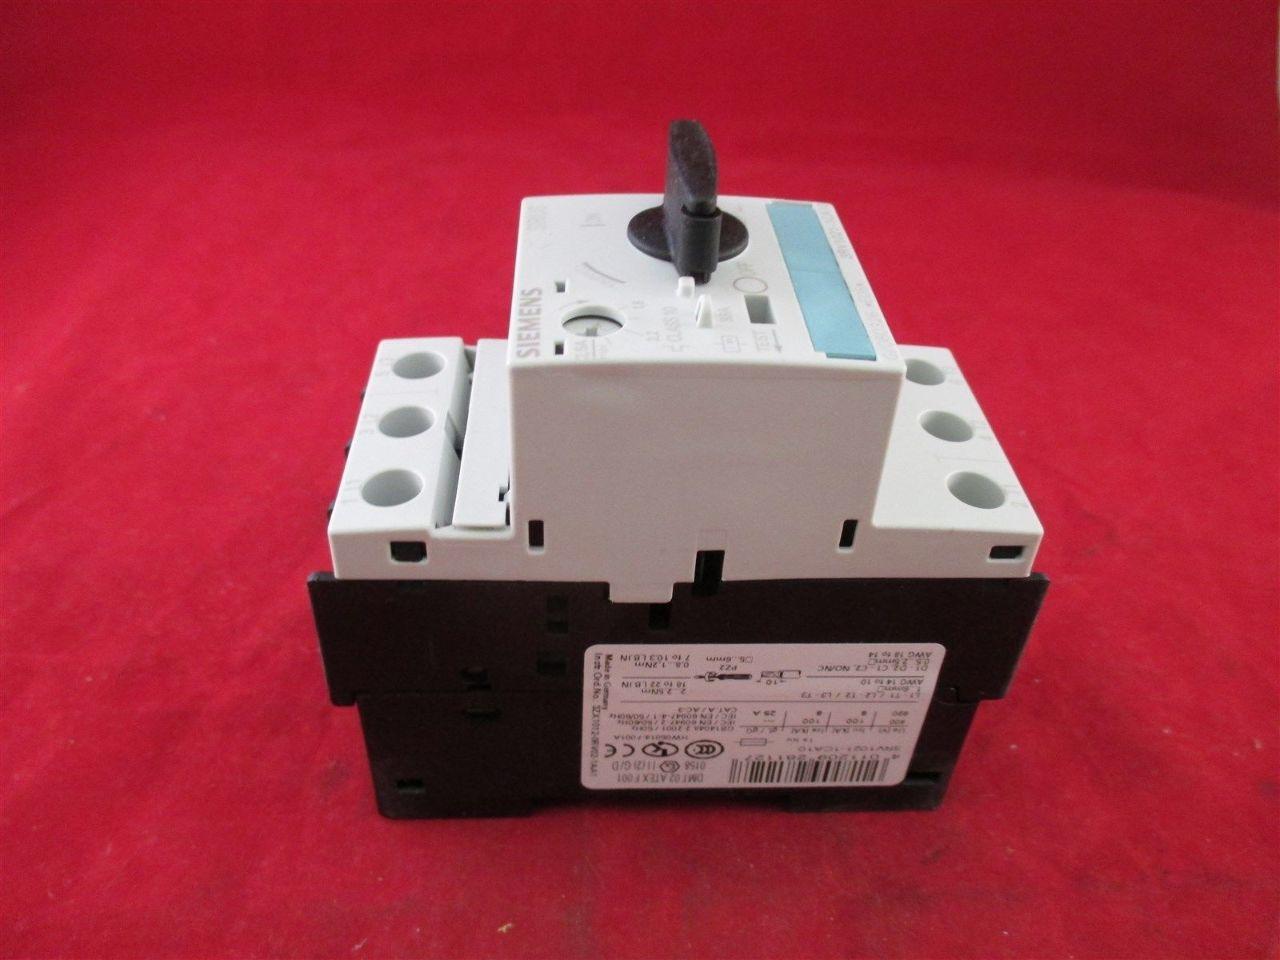 Siemens 3rv1021 1ca10 manual motor starter new process for Siemens manual motor starter